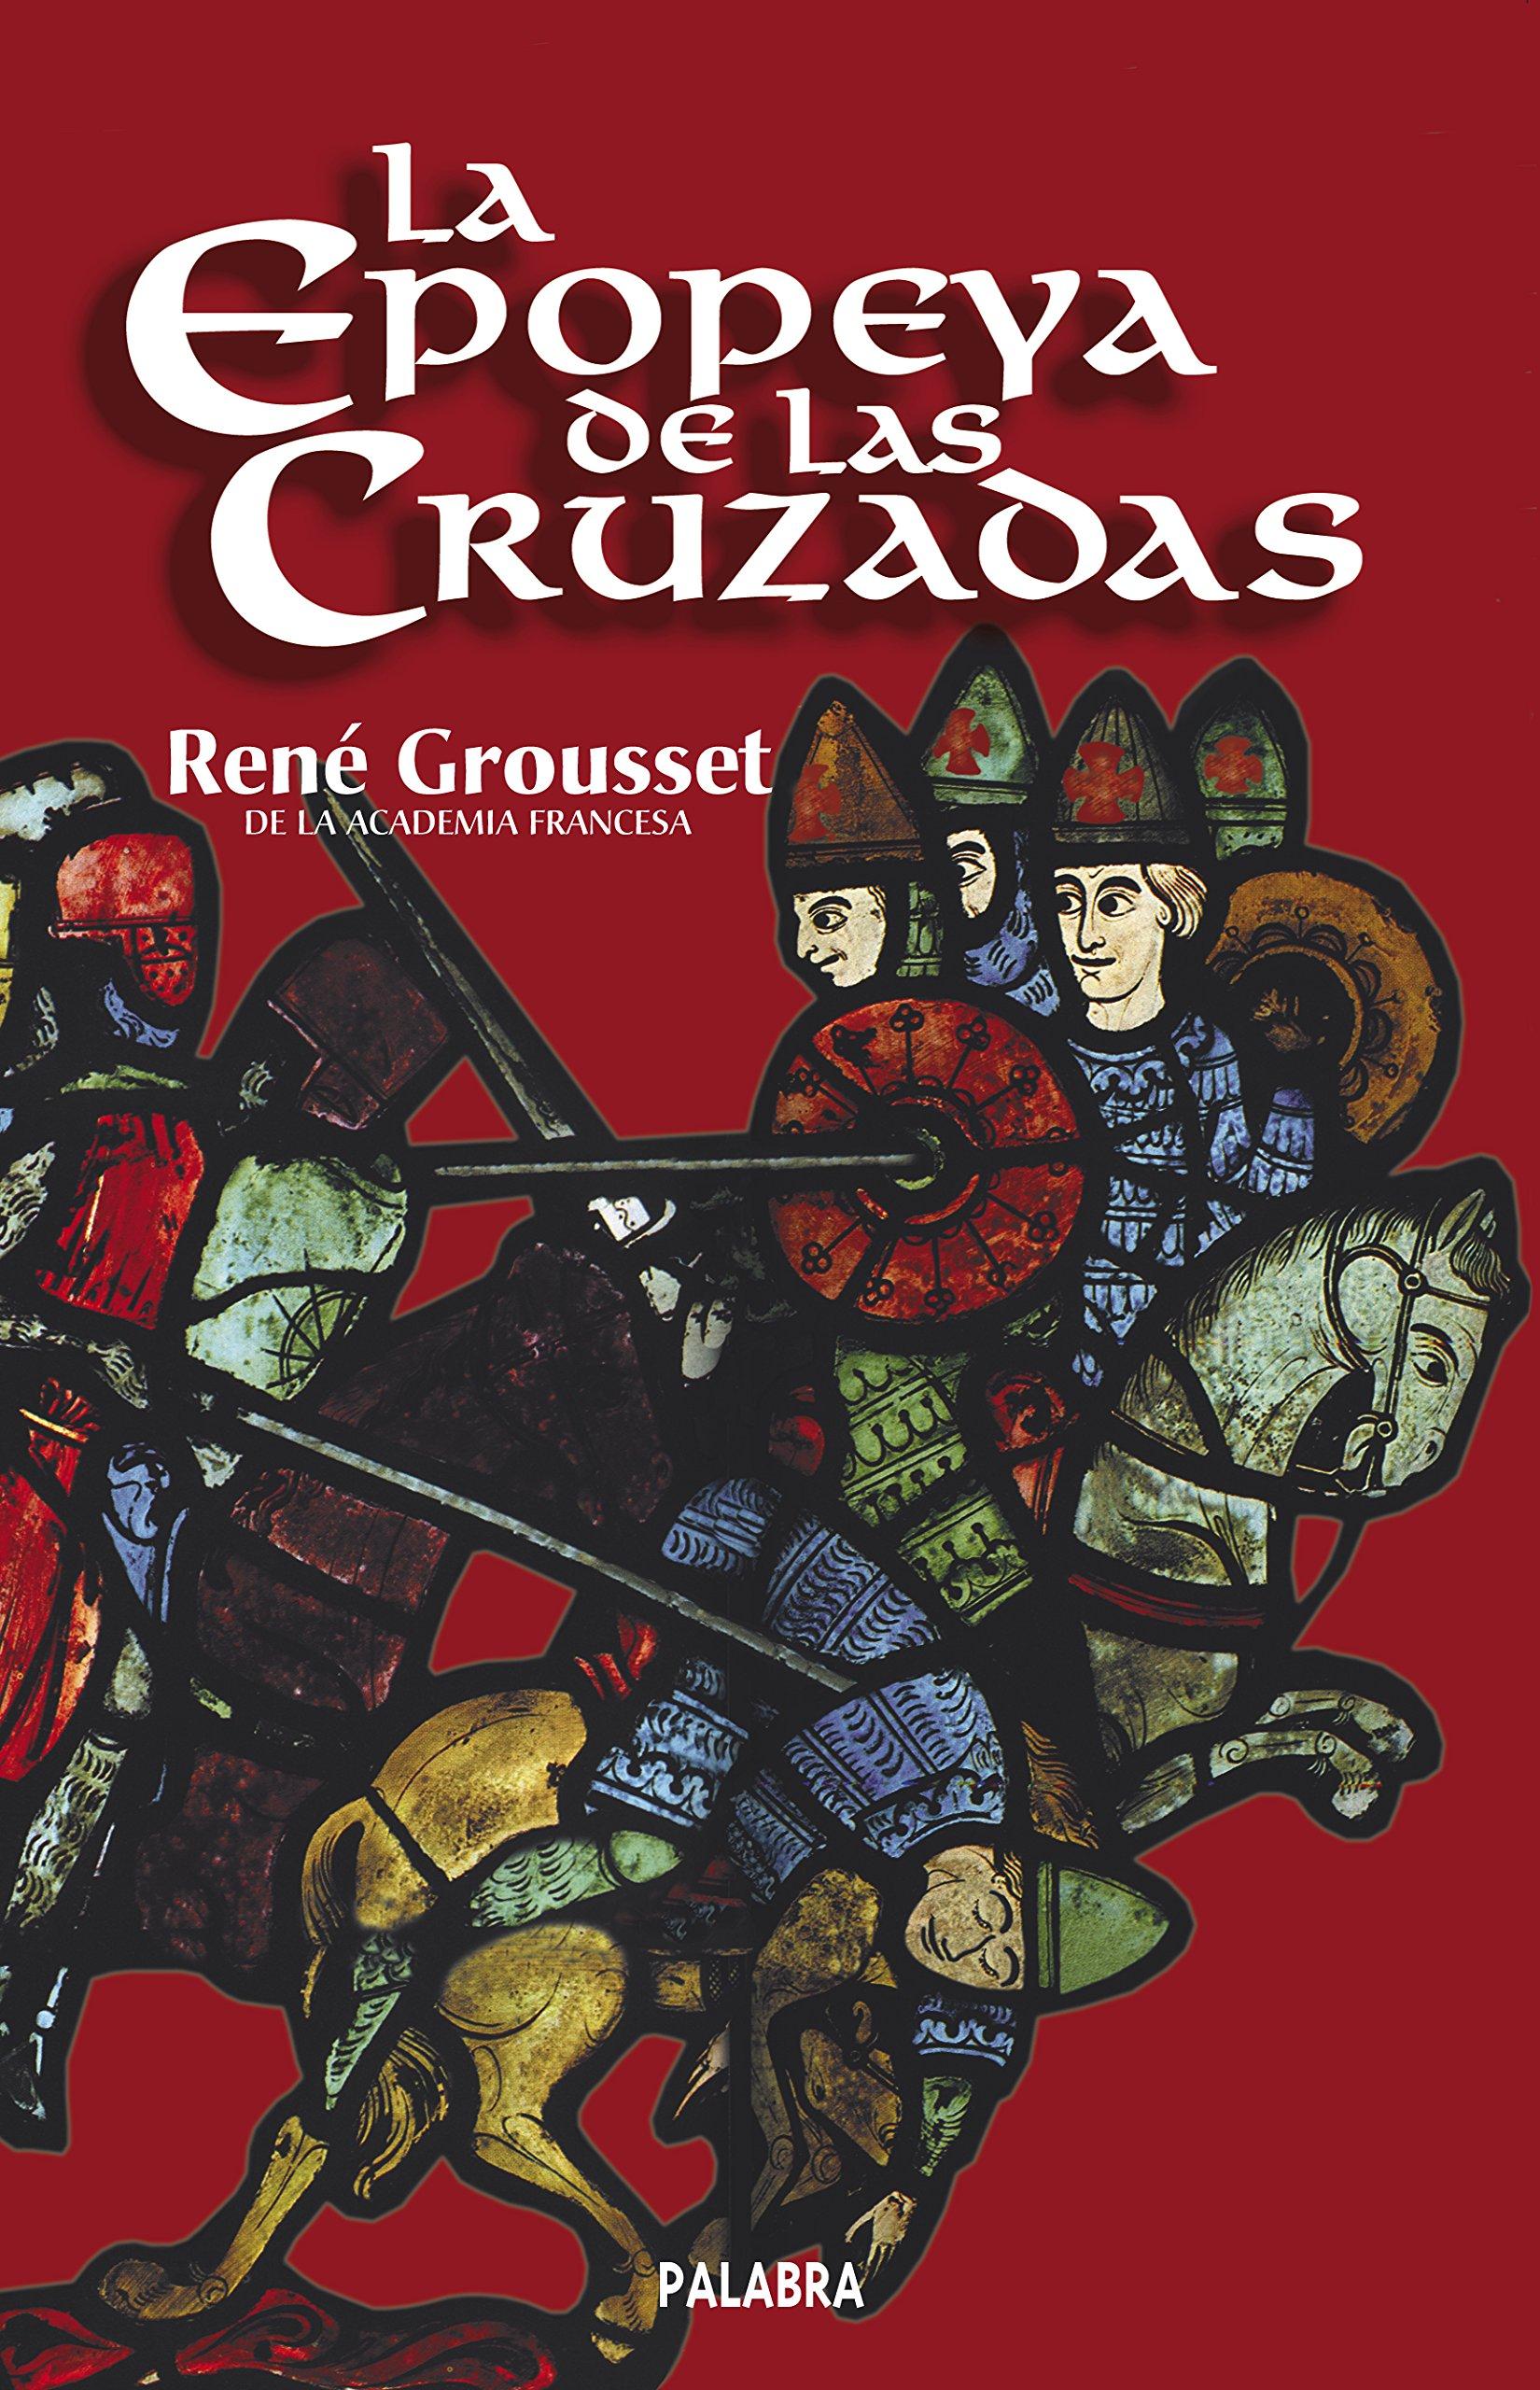 Epopeya de Las Cruzadas (Spanish Edition) pdf epub